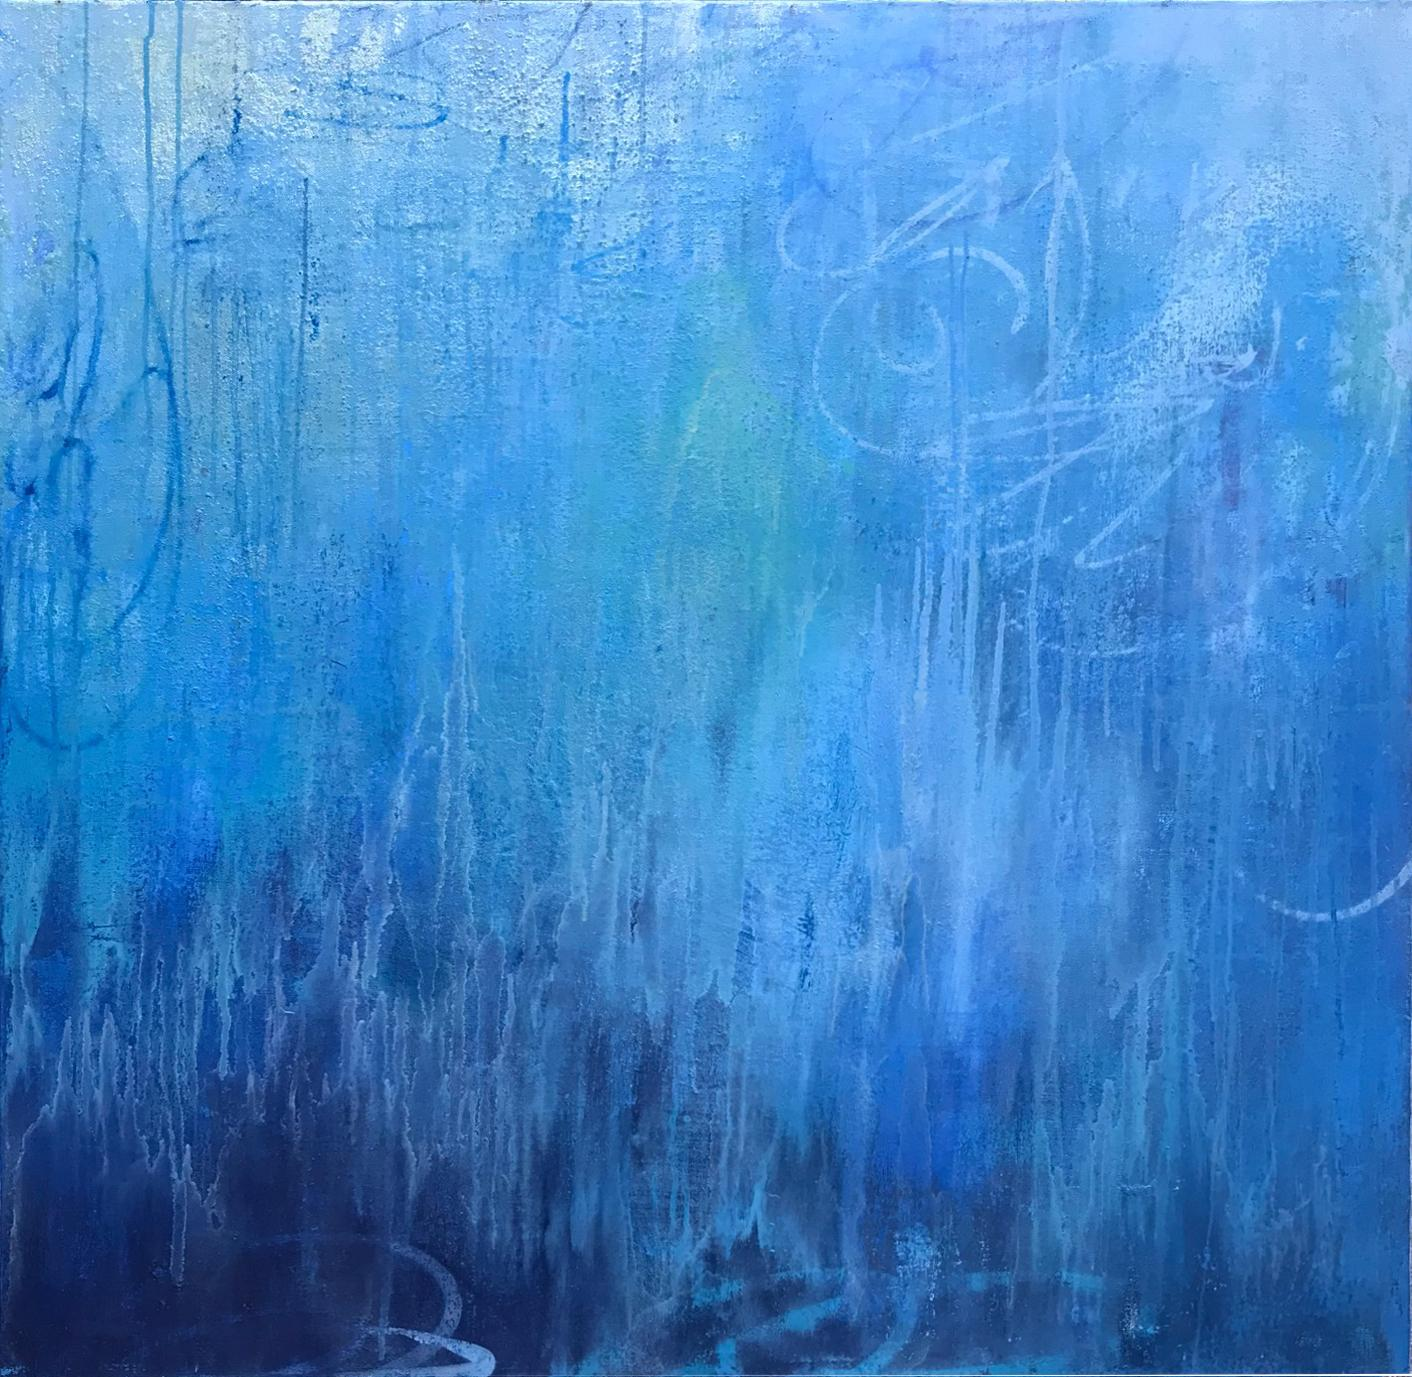 Inner Sanctum, 2018, Acrylic, Oil, Spray Paint on Canvas, Signed on Verso